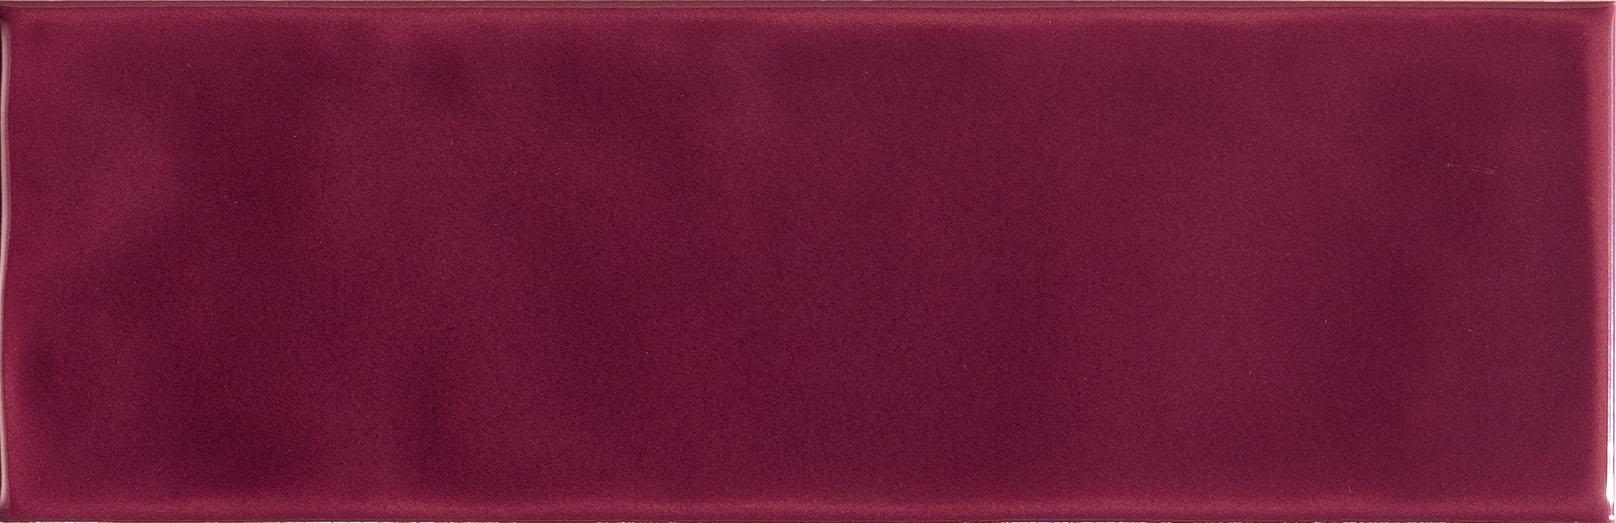 0190936, Brick Inspiration, Punainen, seina